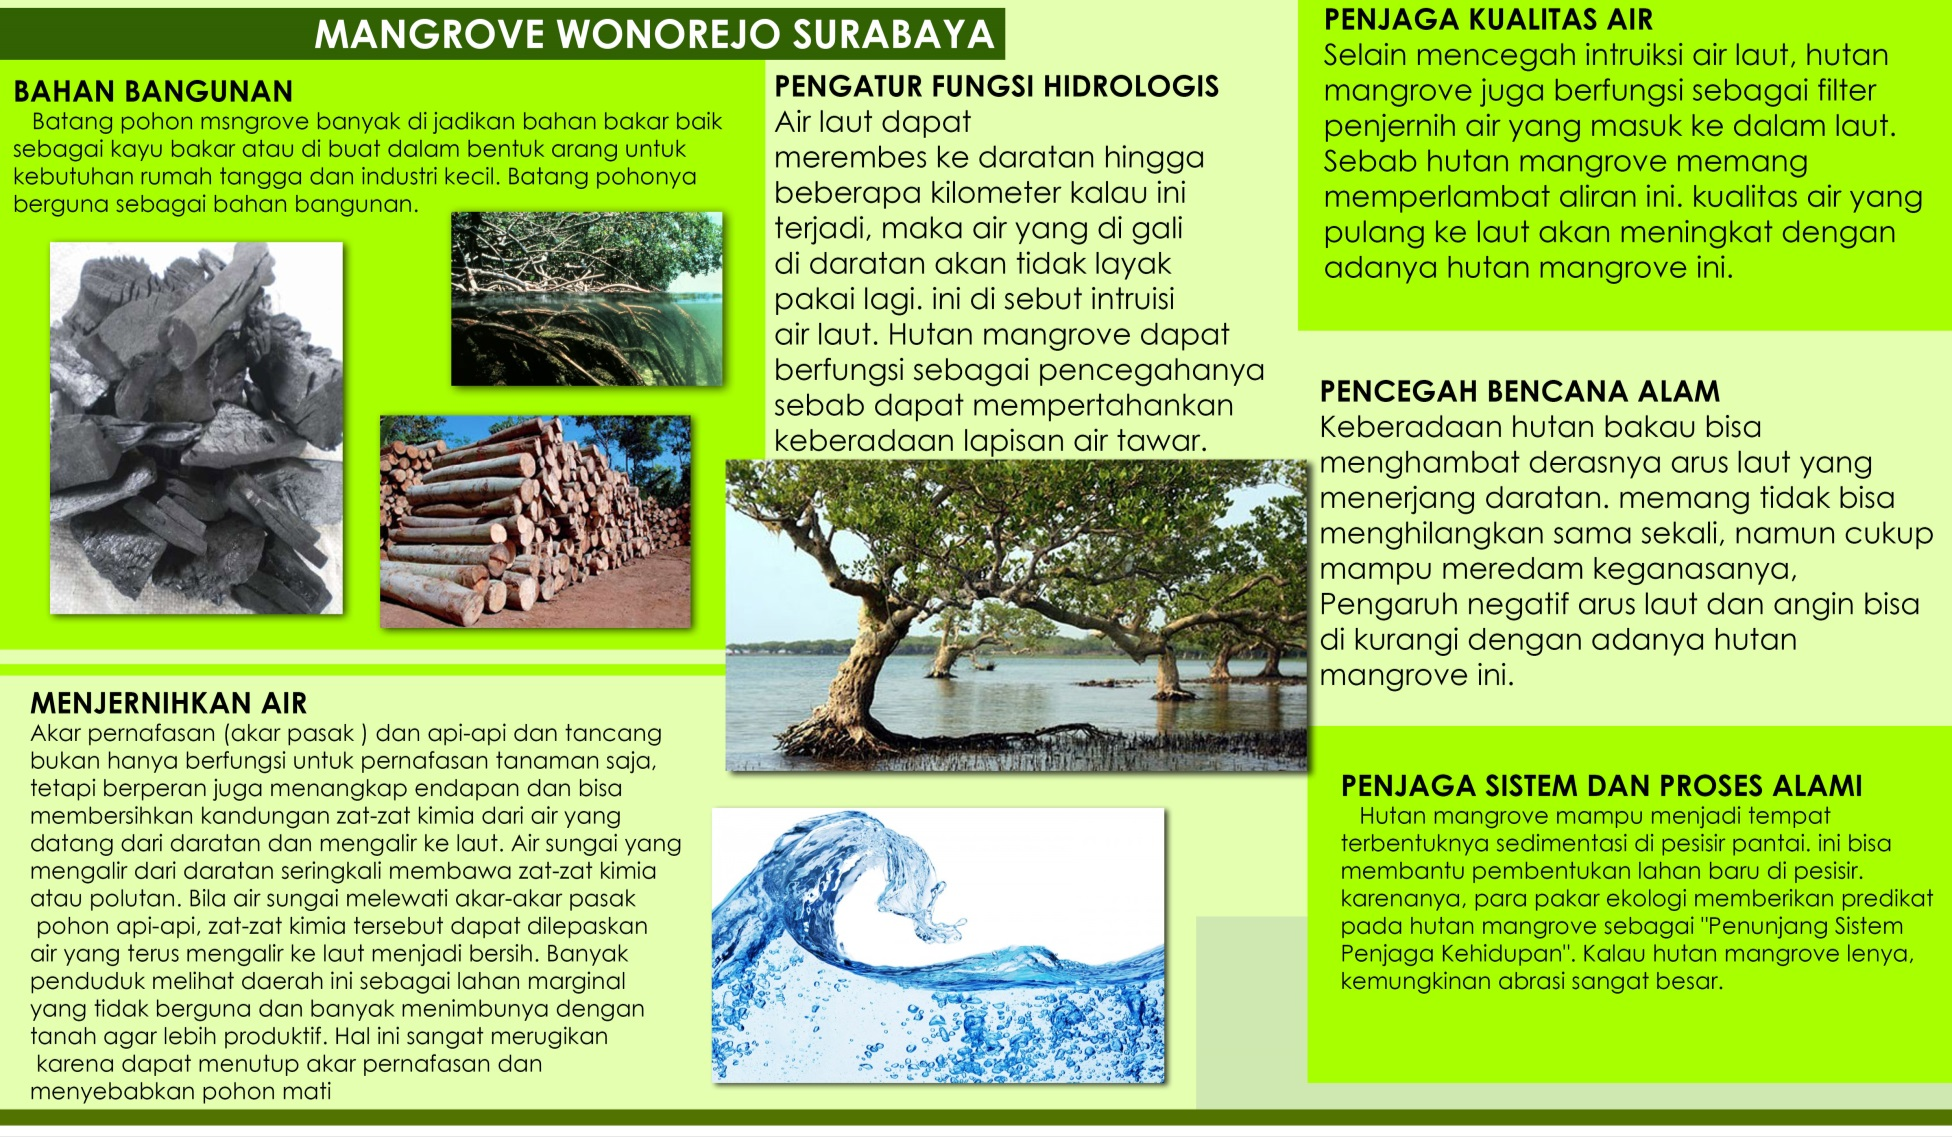 hight resolution of ekowisata mangrove wonorejo surabaya